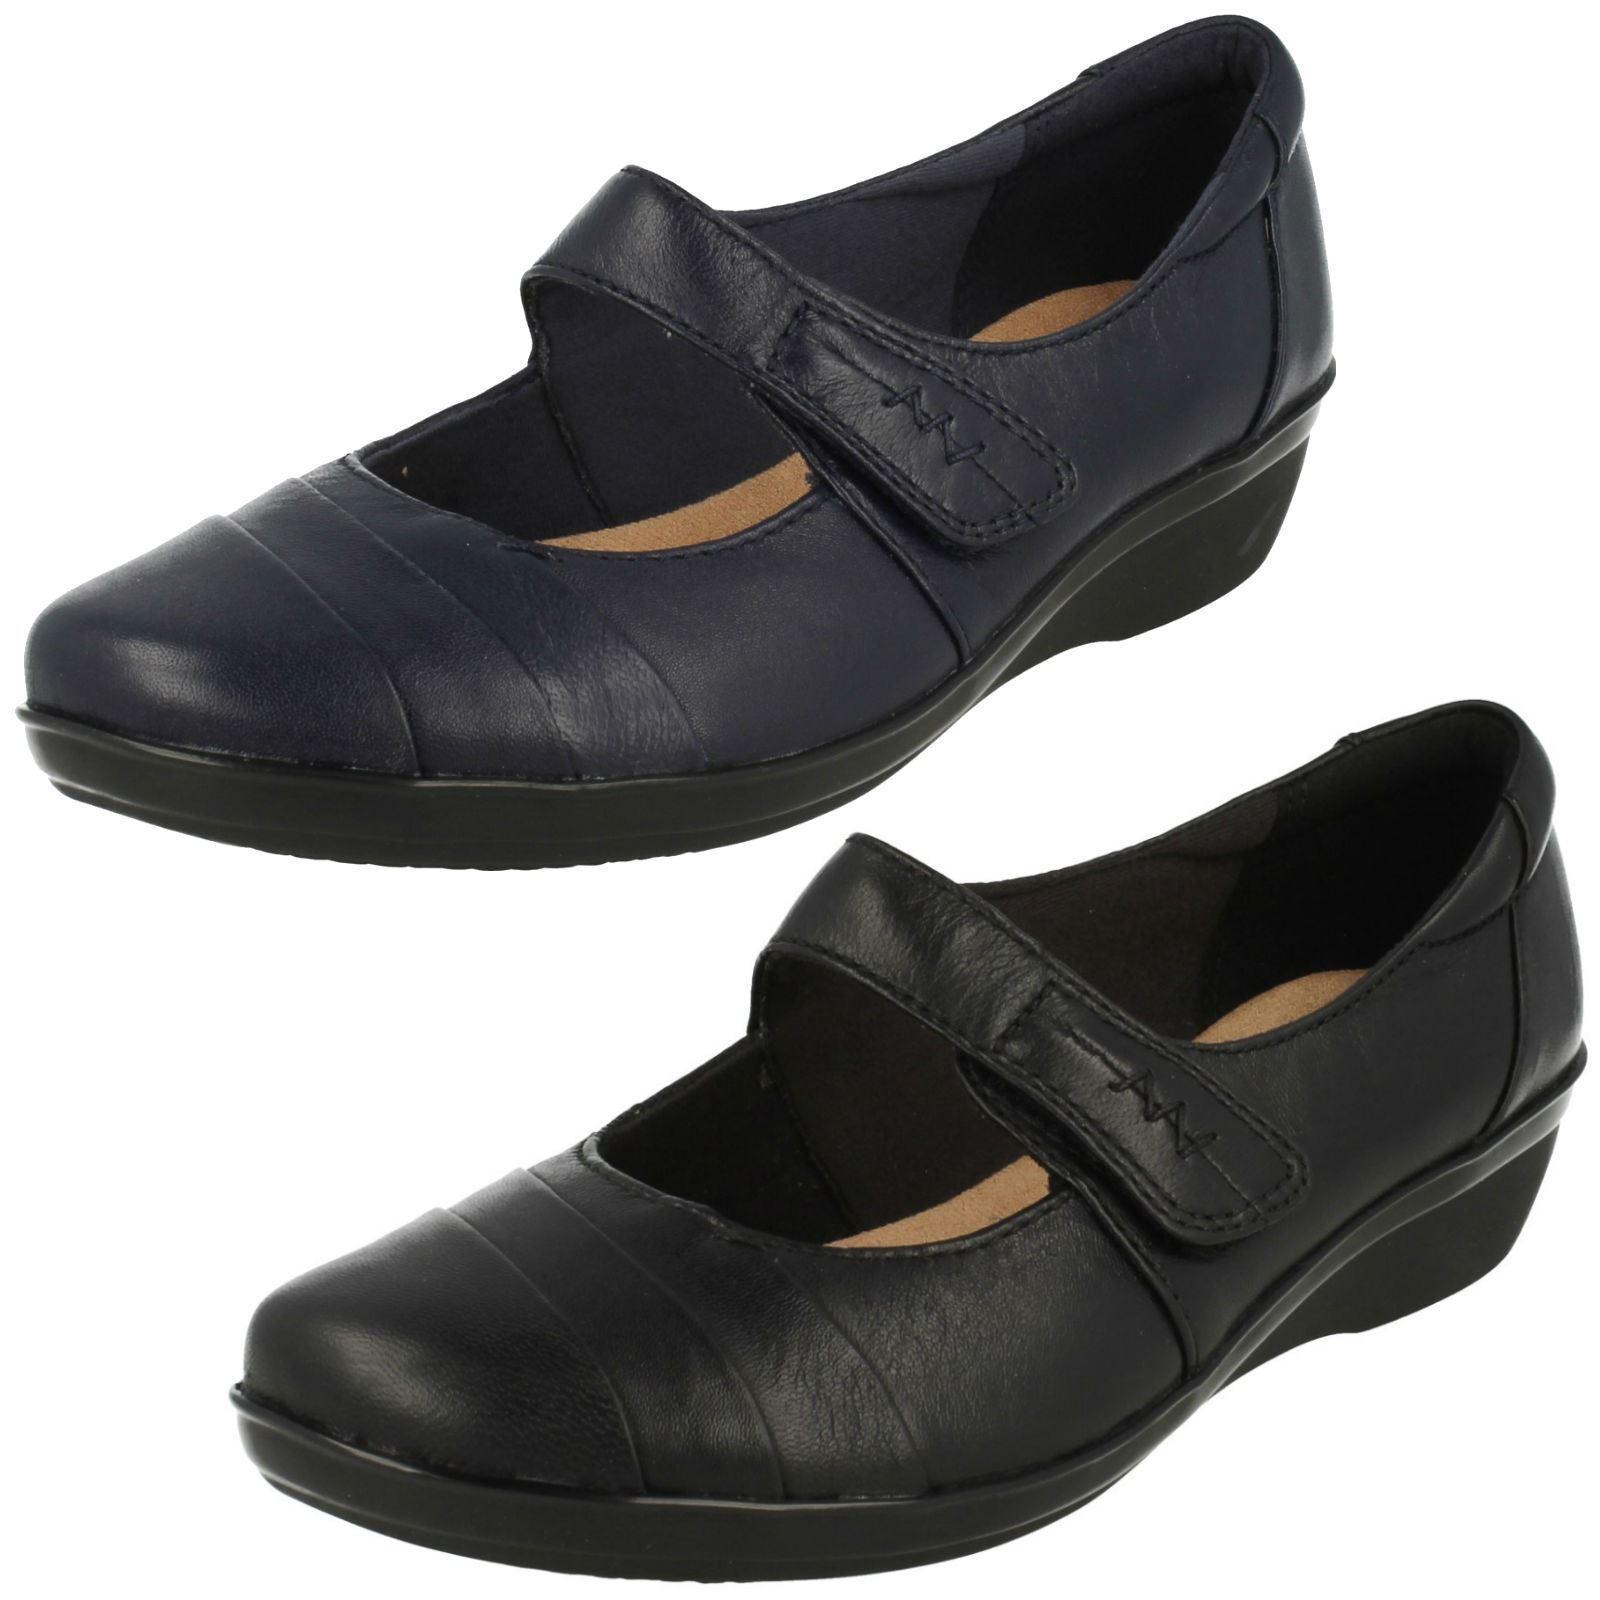 Clarks Damen Schuhe Kennon Everlay 07159jort94763